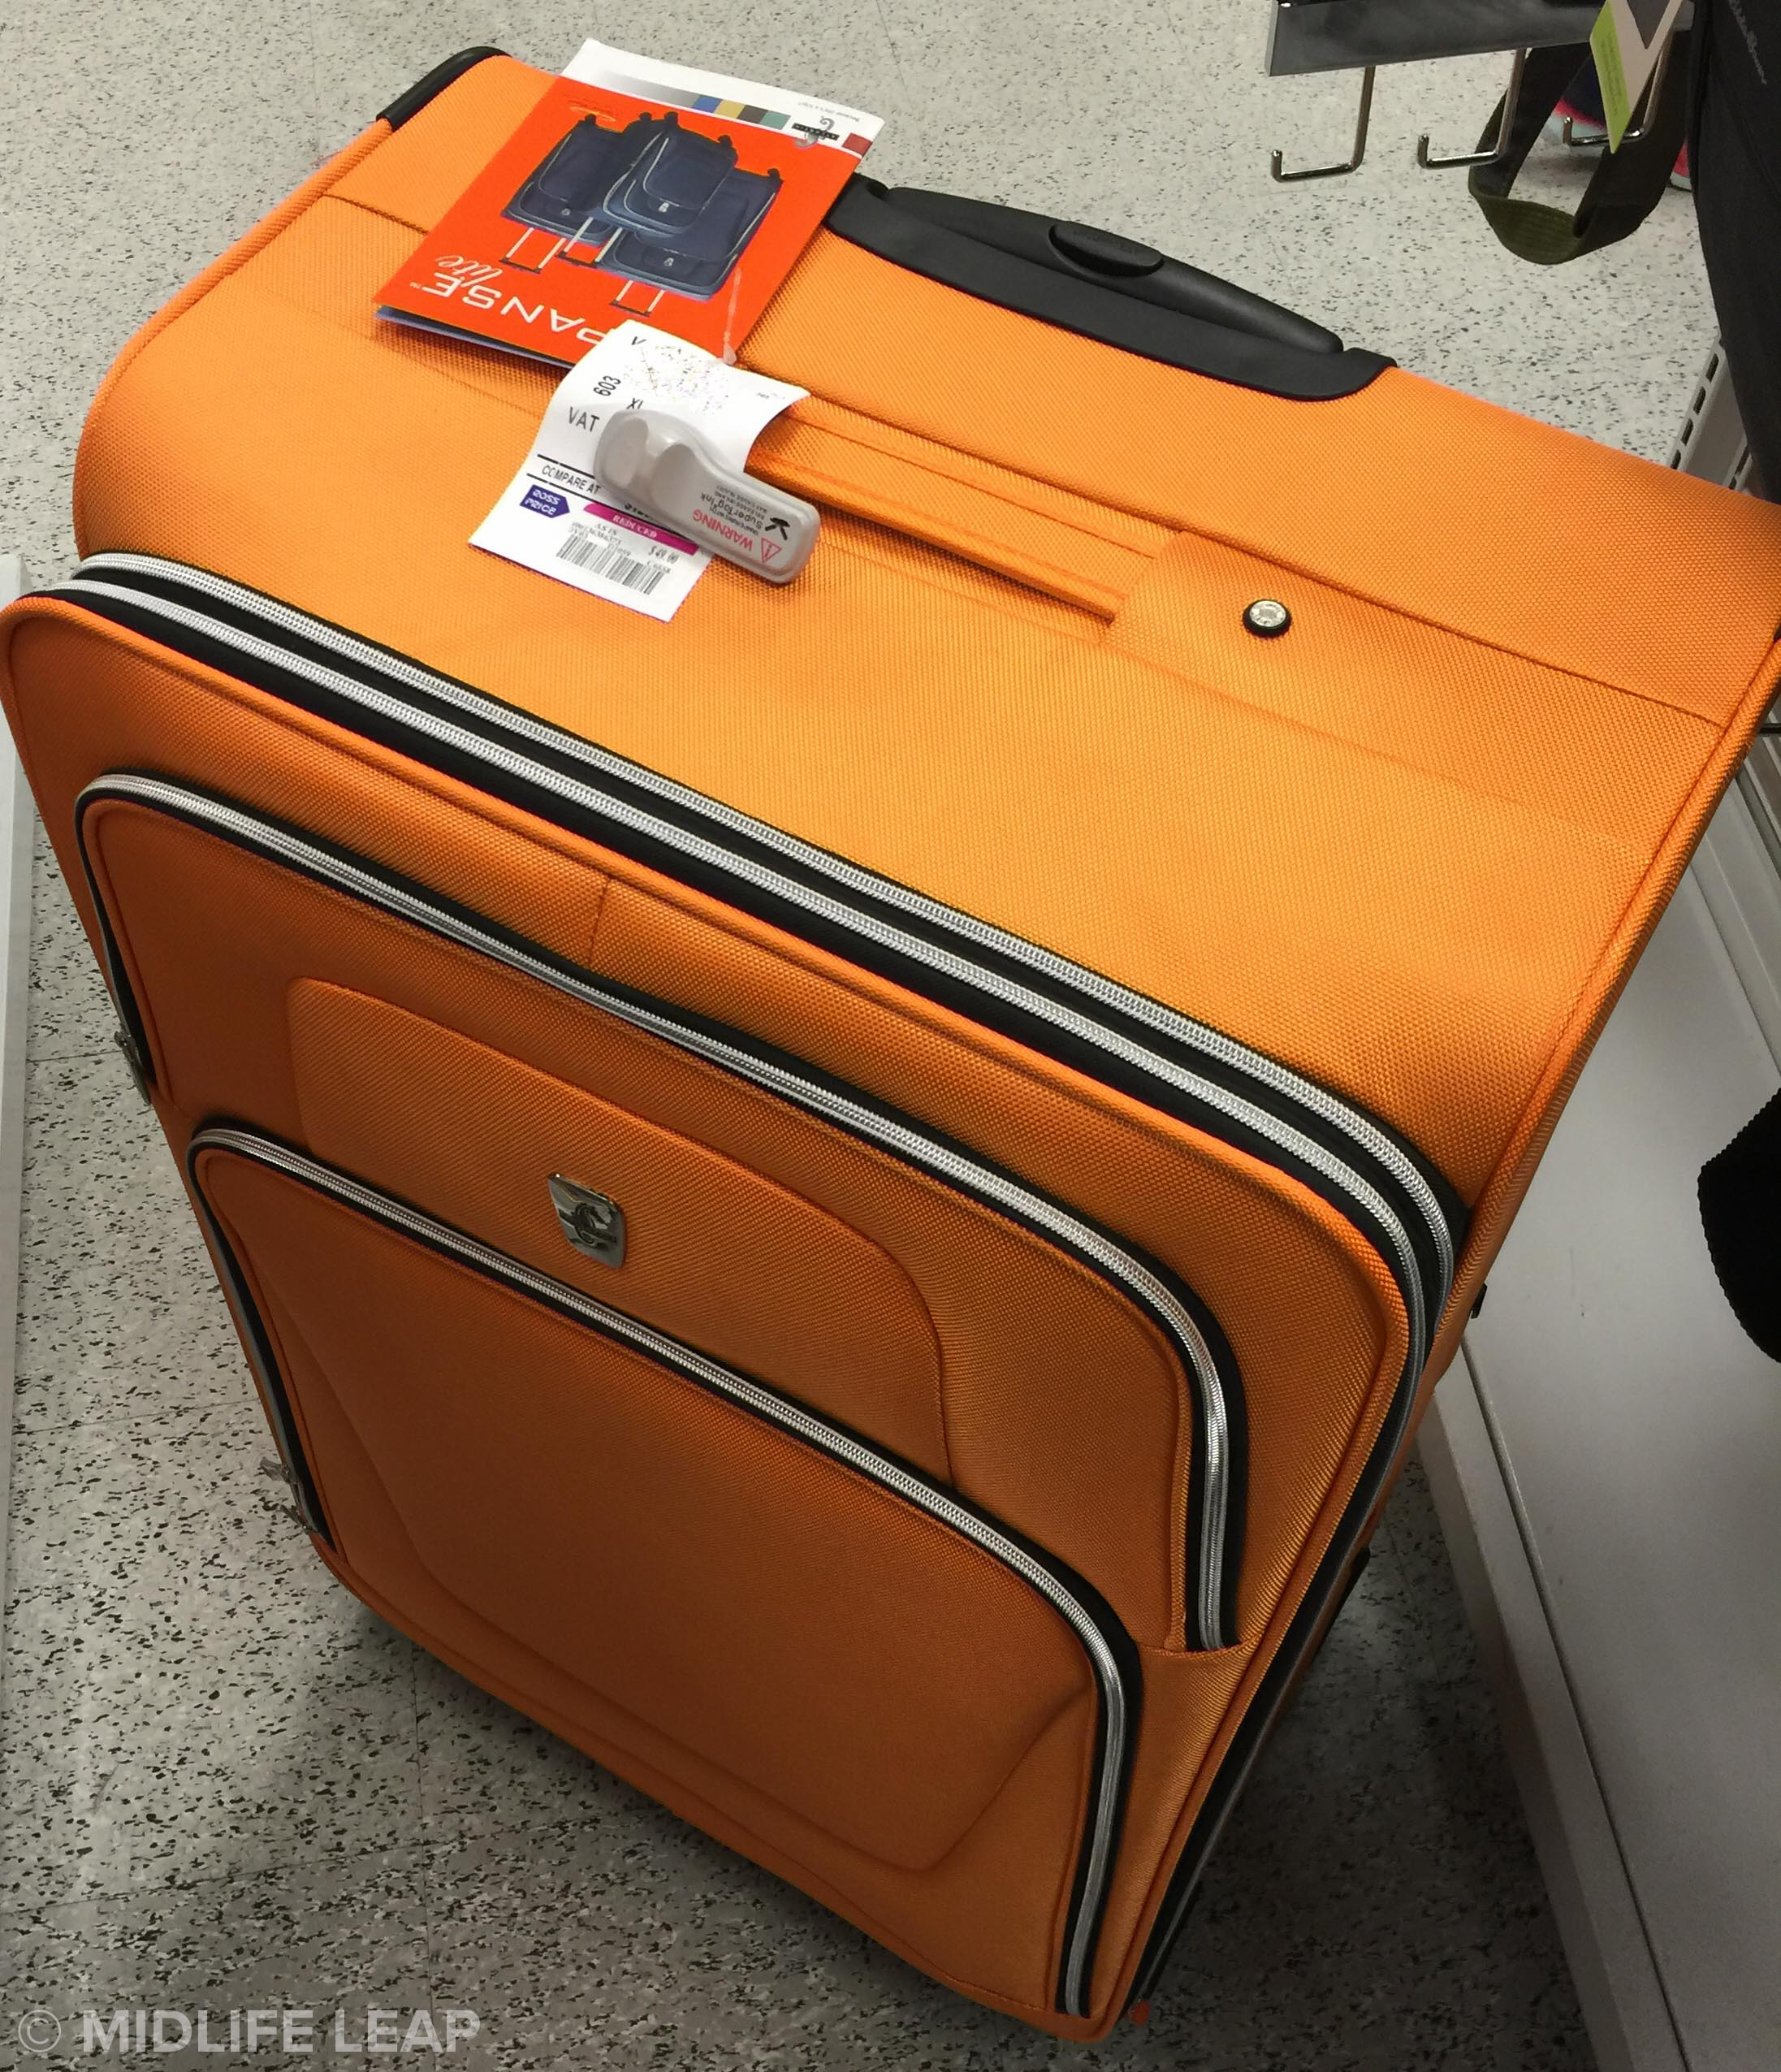 The giant orange suitcase